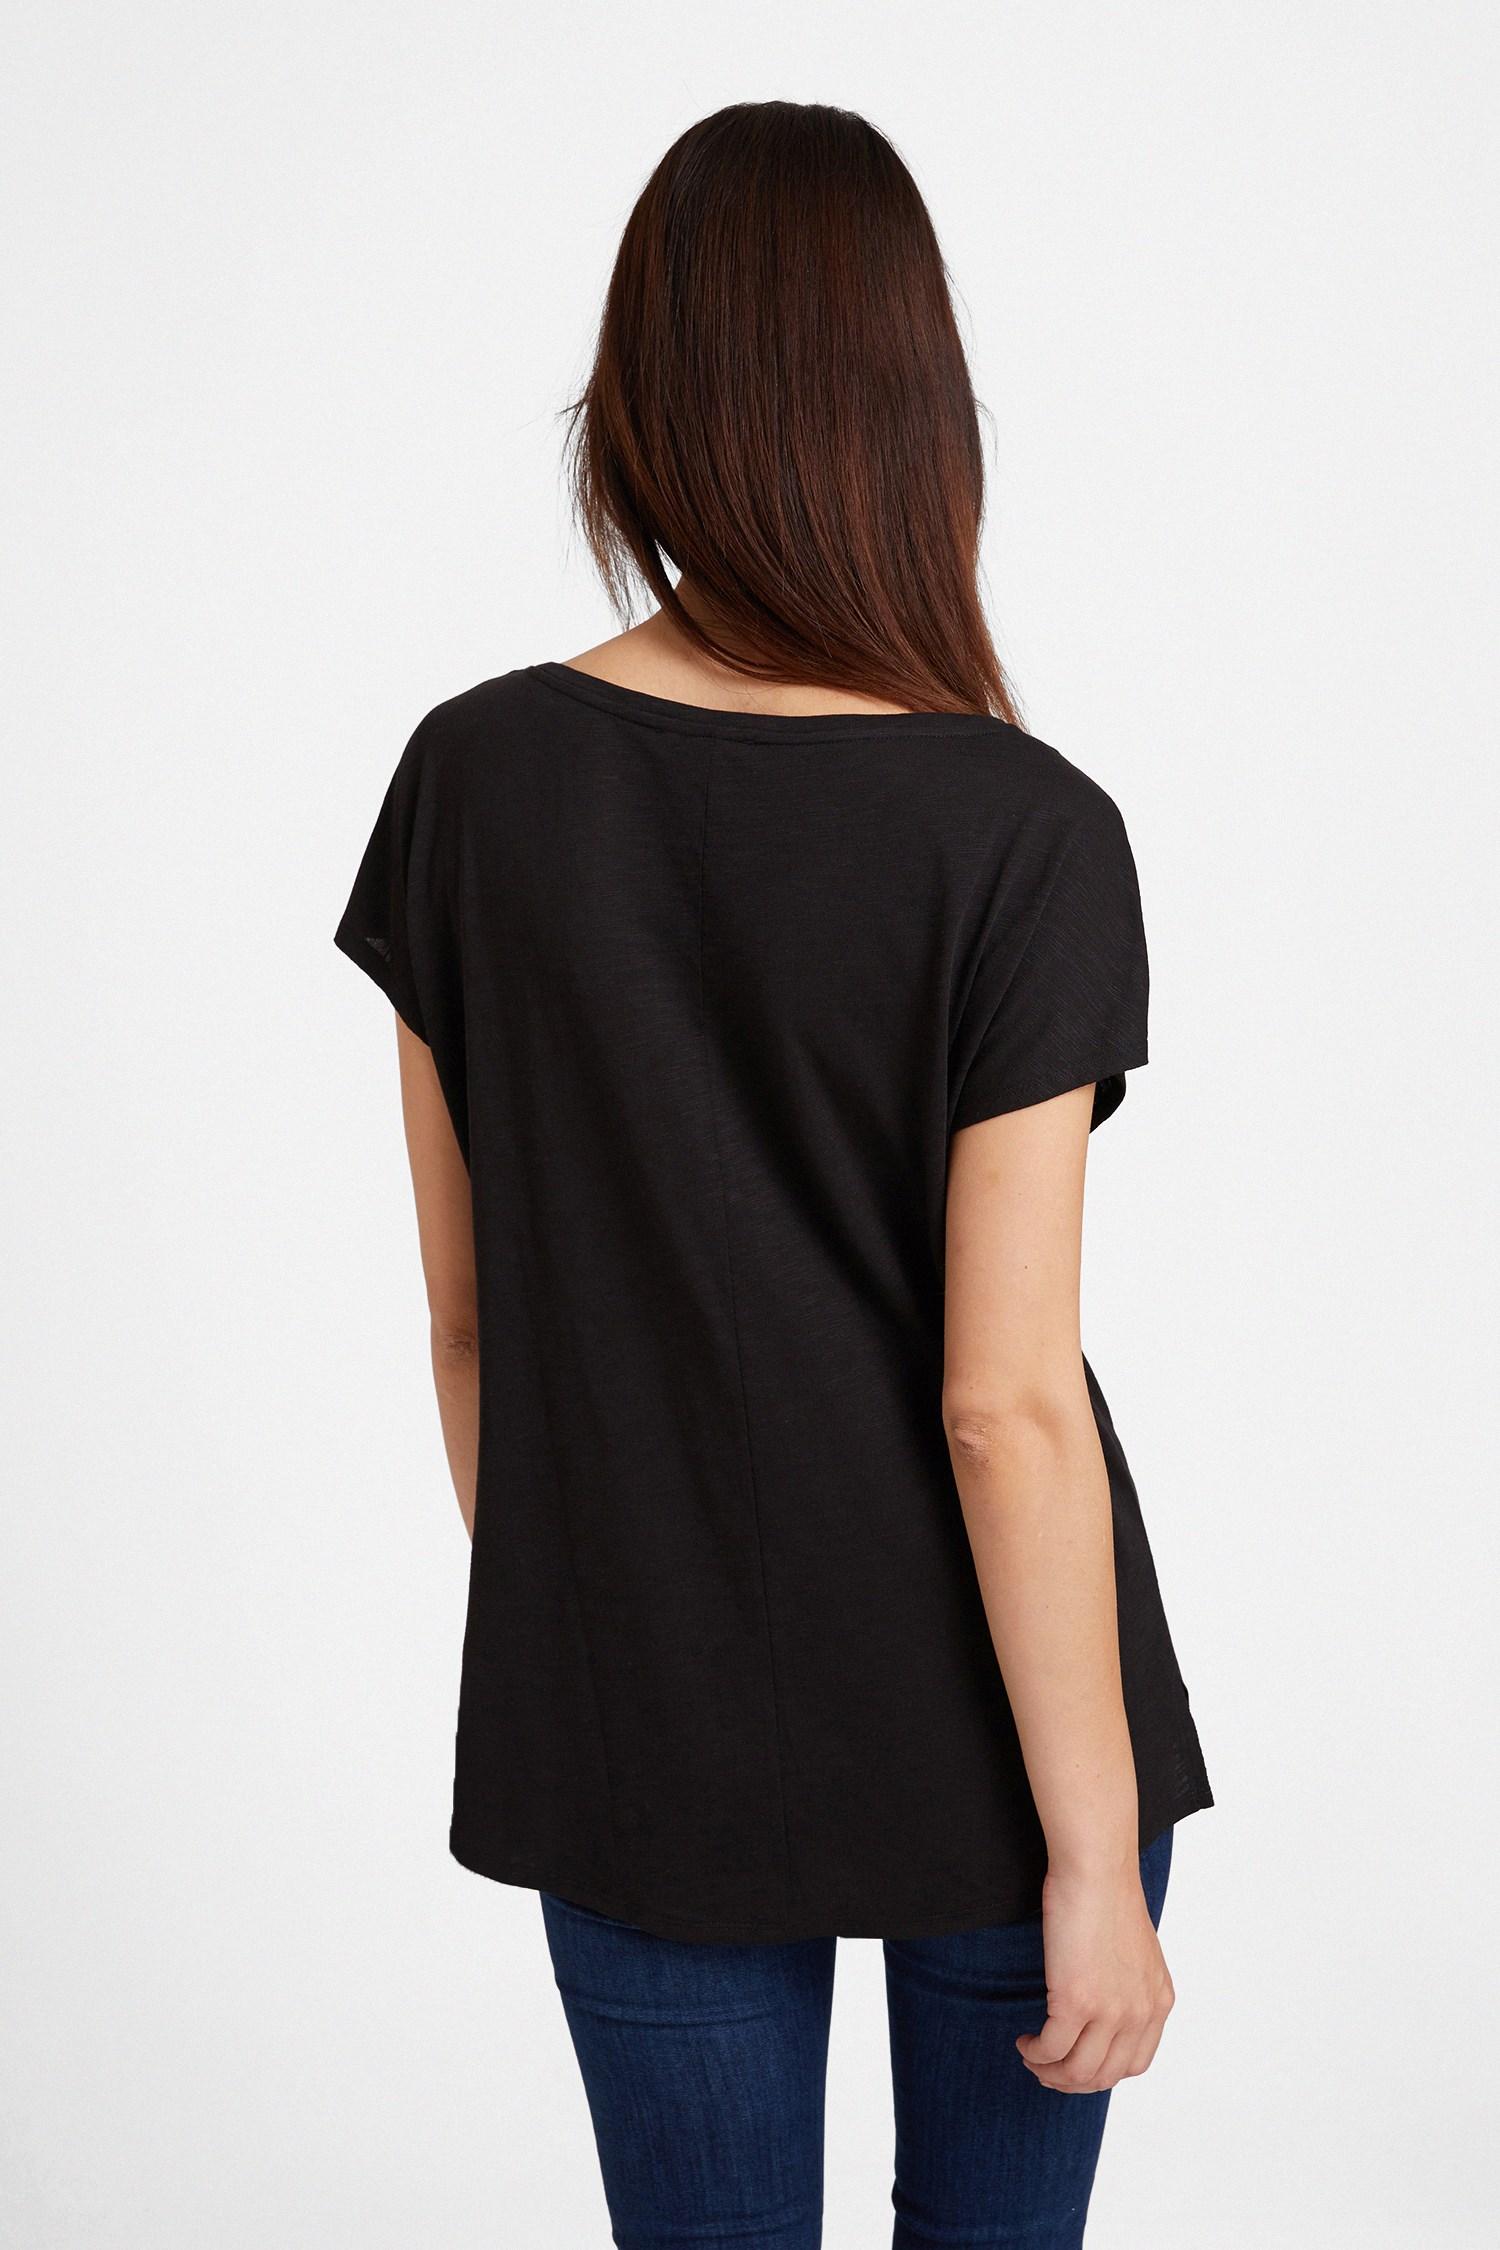 Bayan Siyah Bot Yaka Modal Karışımlı Tişört